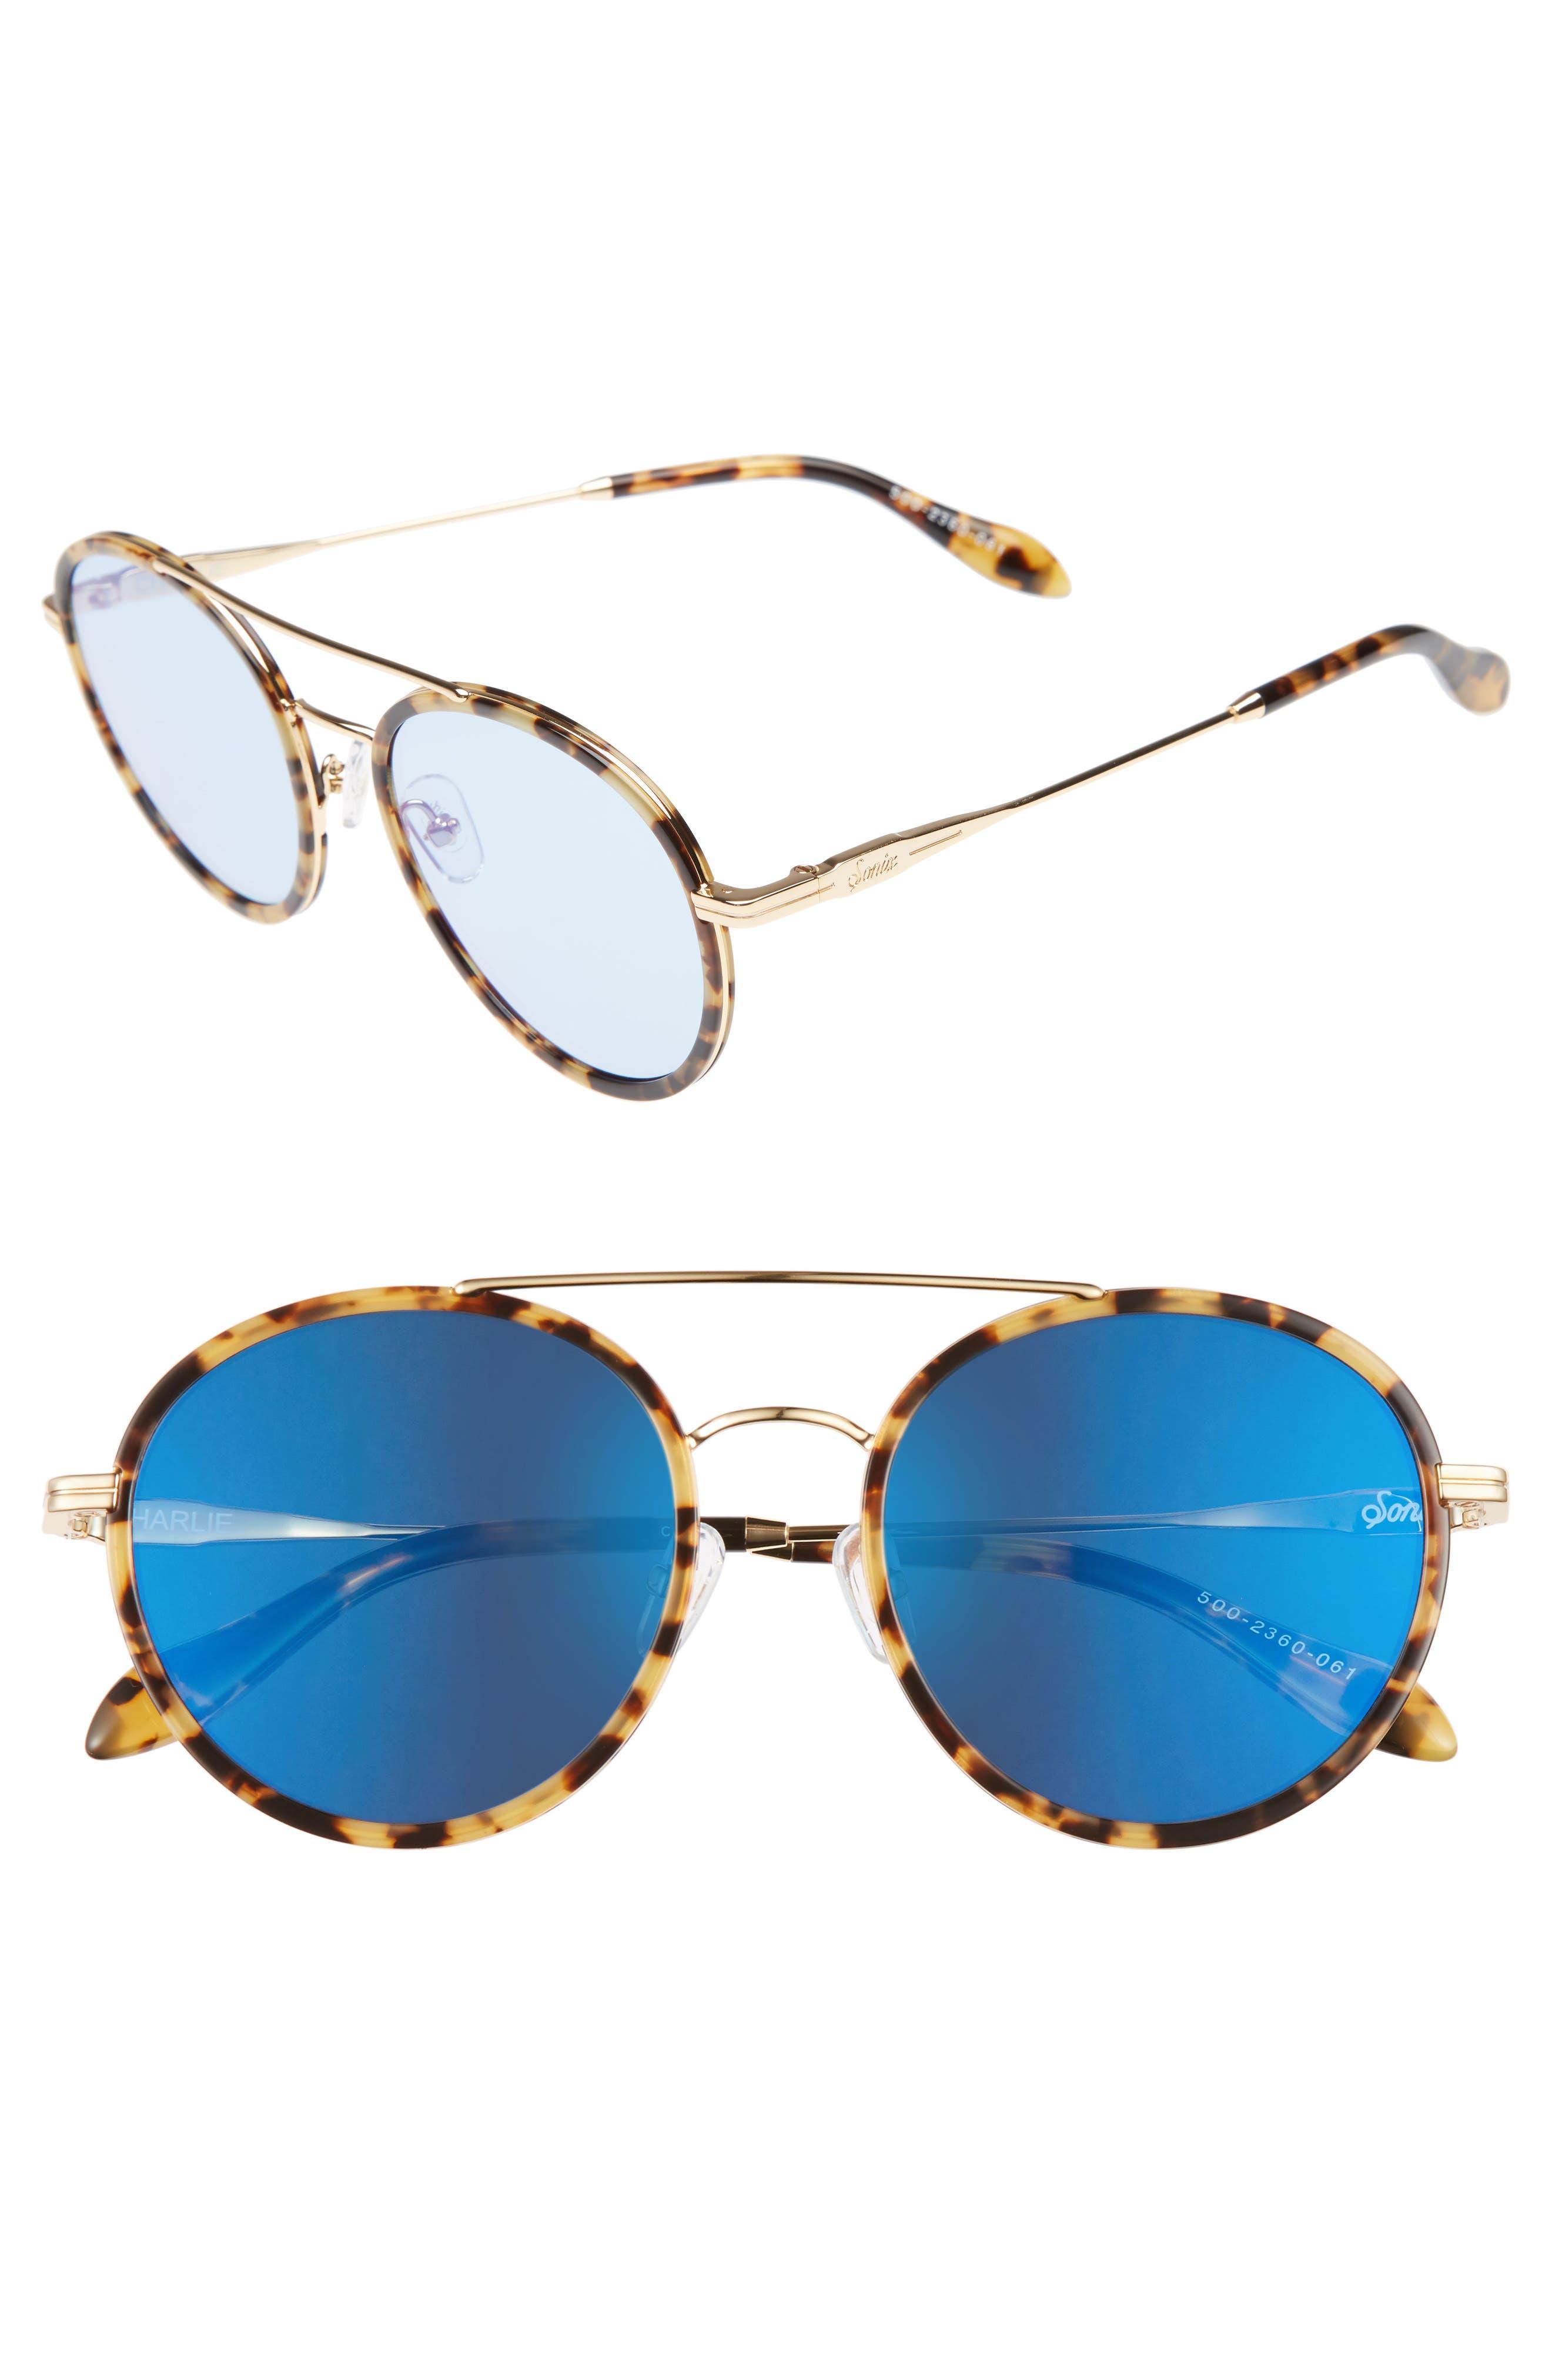 Charli 50mm Mirrored Lens Round Sunglasses,                         Main,                         color, Brown Tortoise/ Powder Mirror